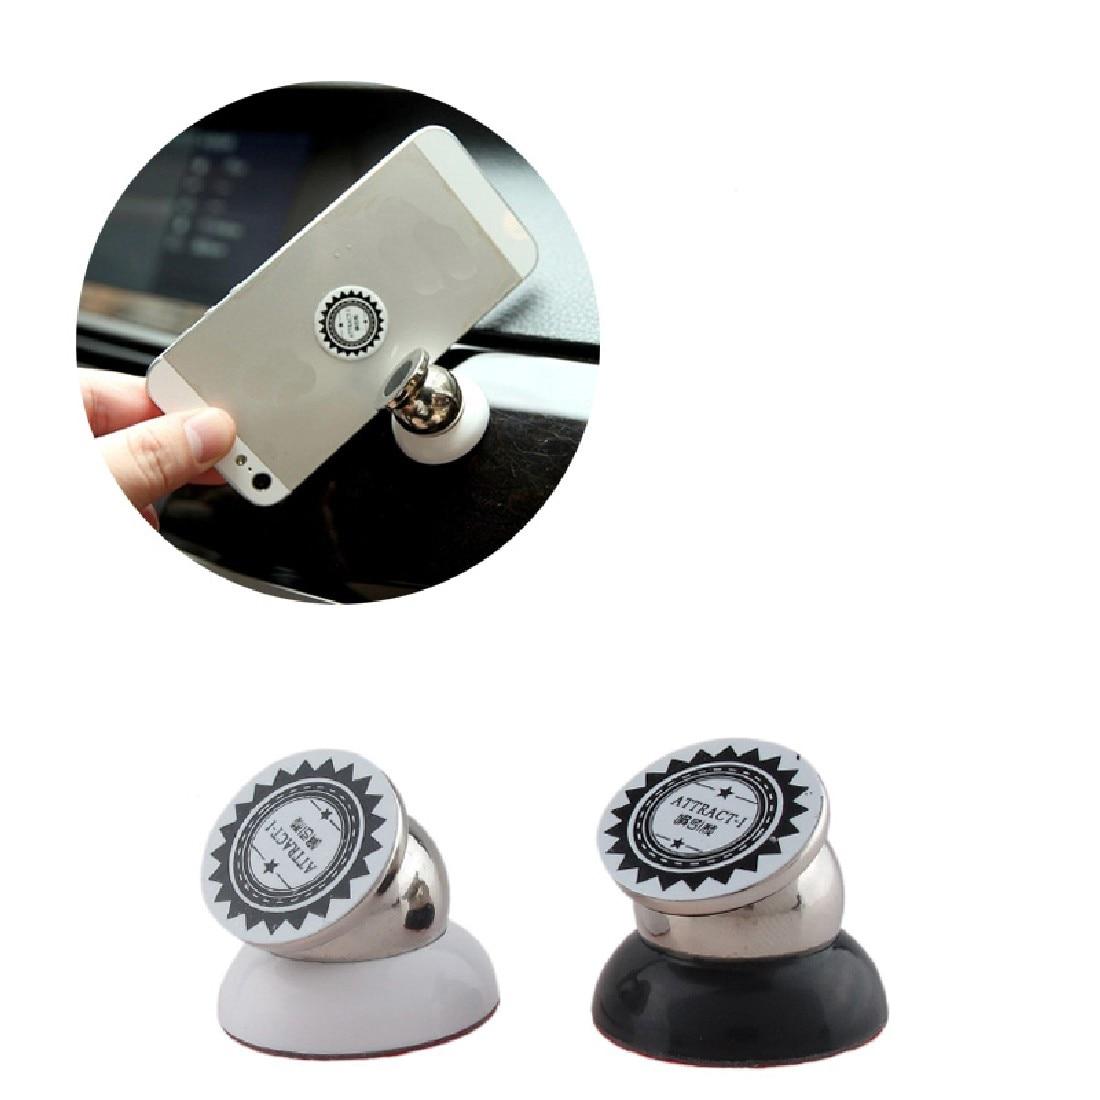 Portable universal adjustable car air vent mount holder 4